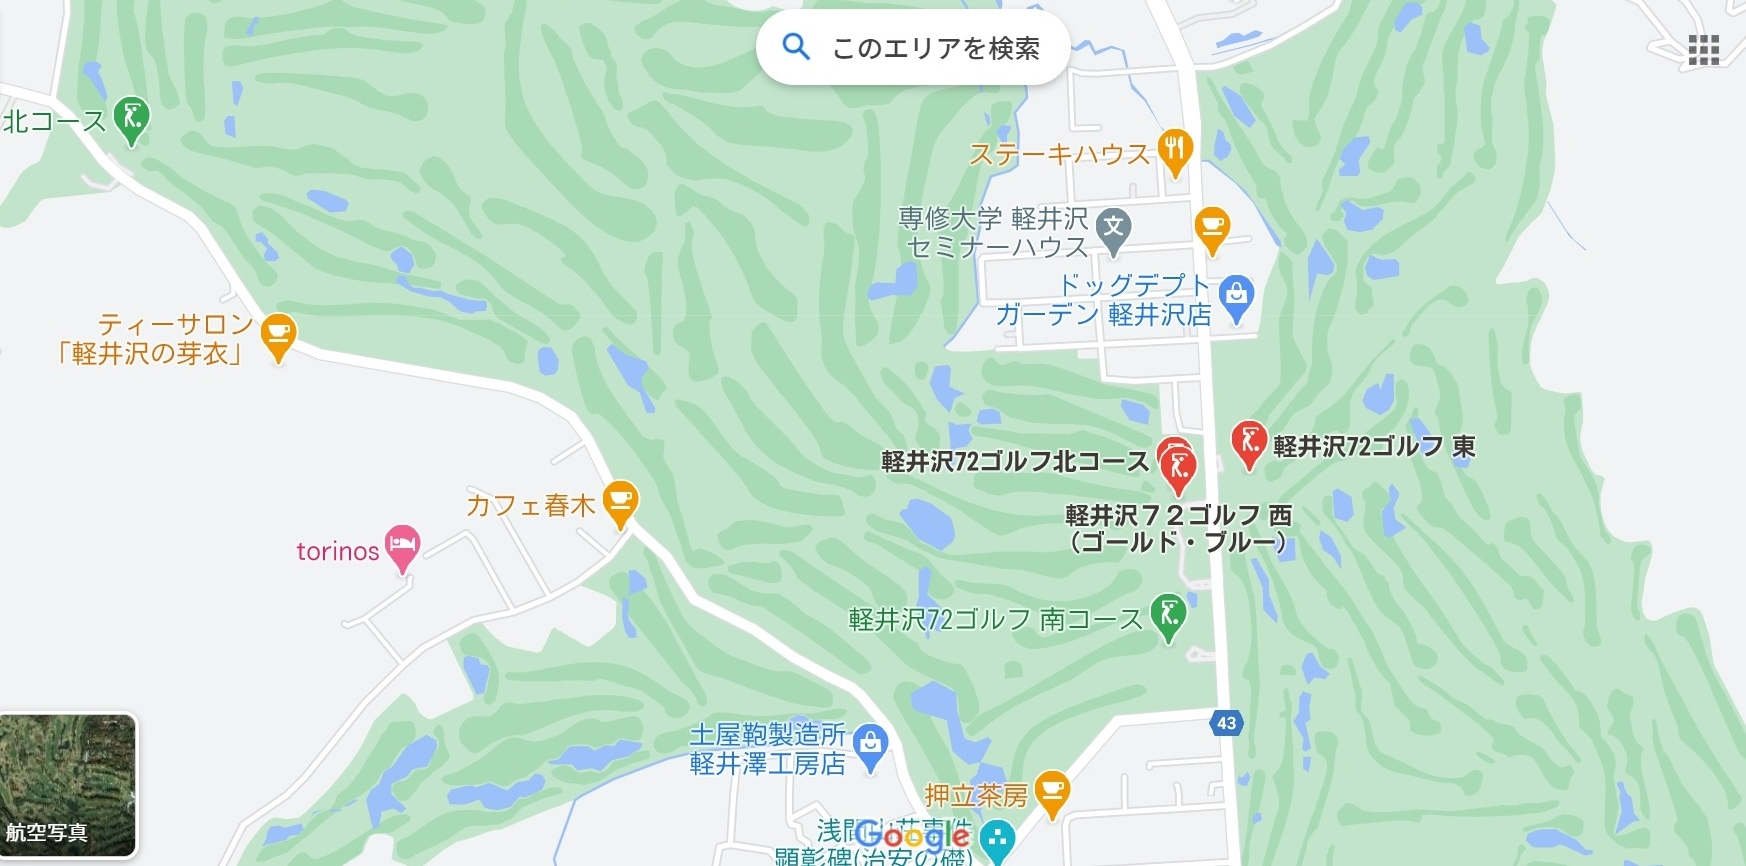 karuizawa72golf.jpg